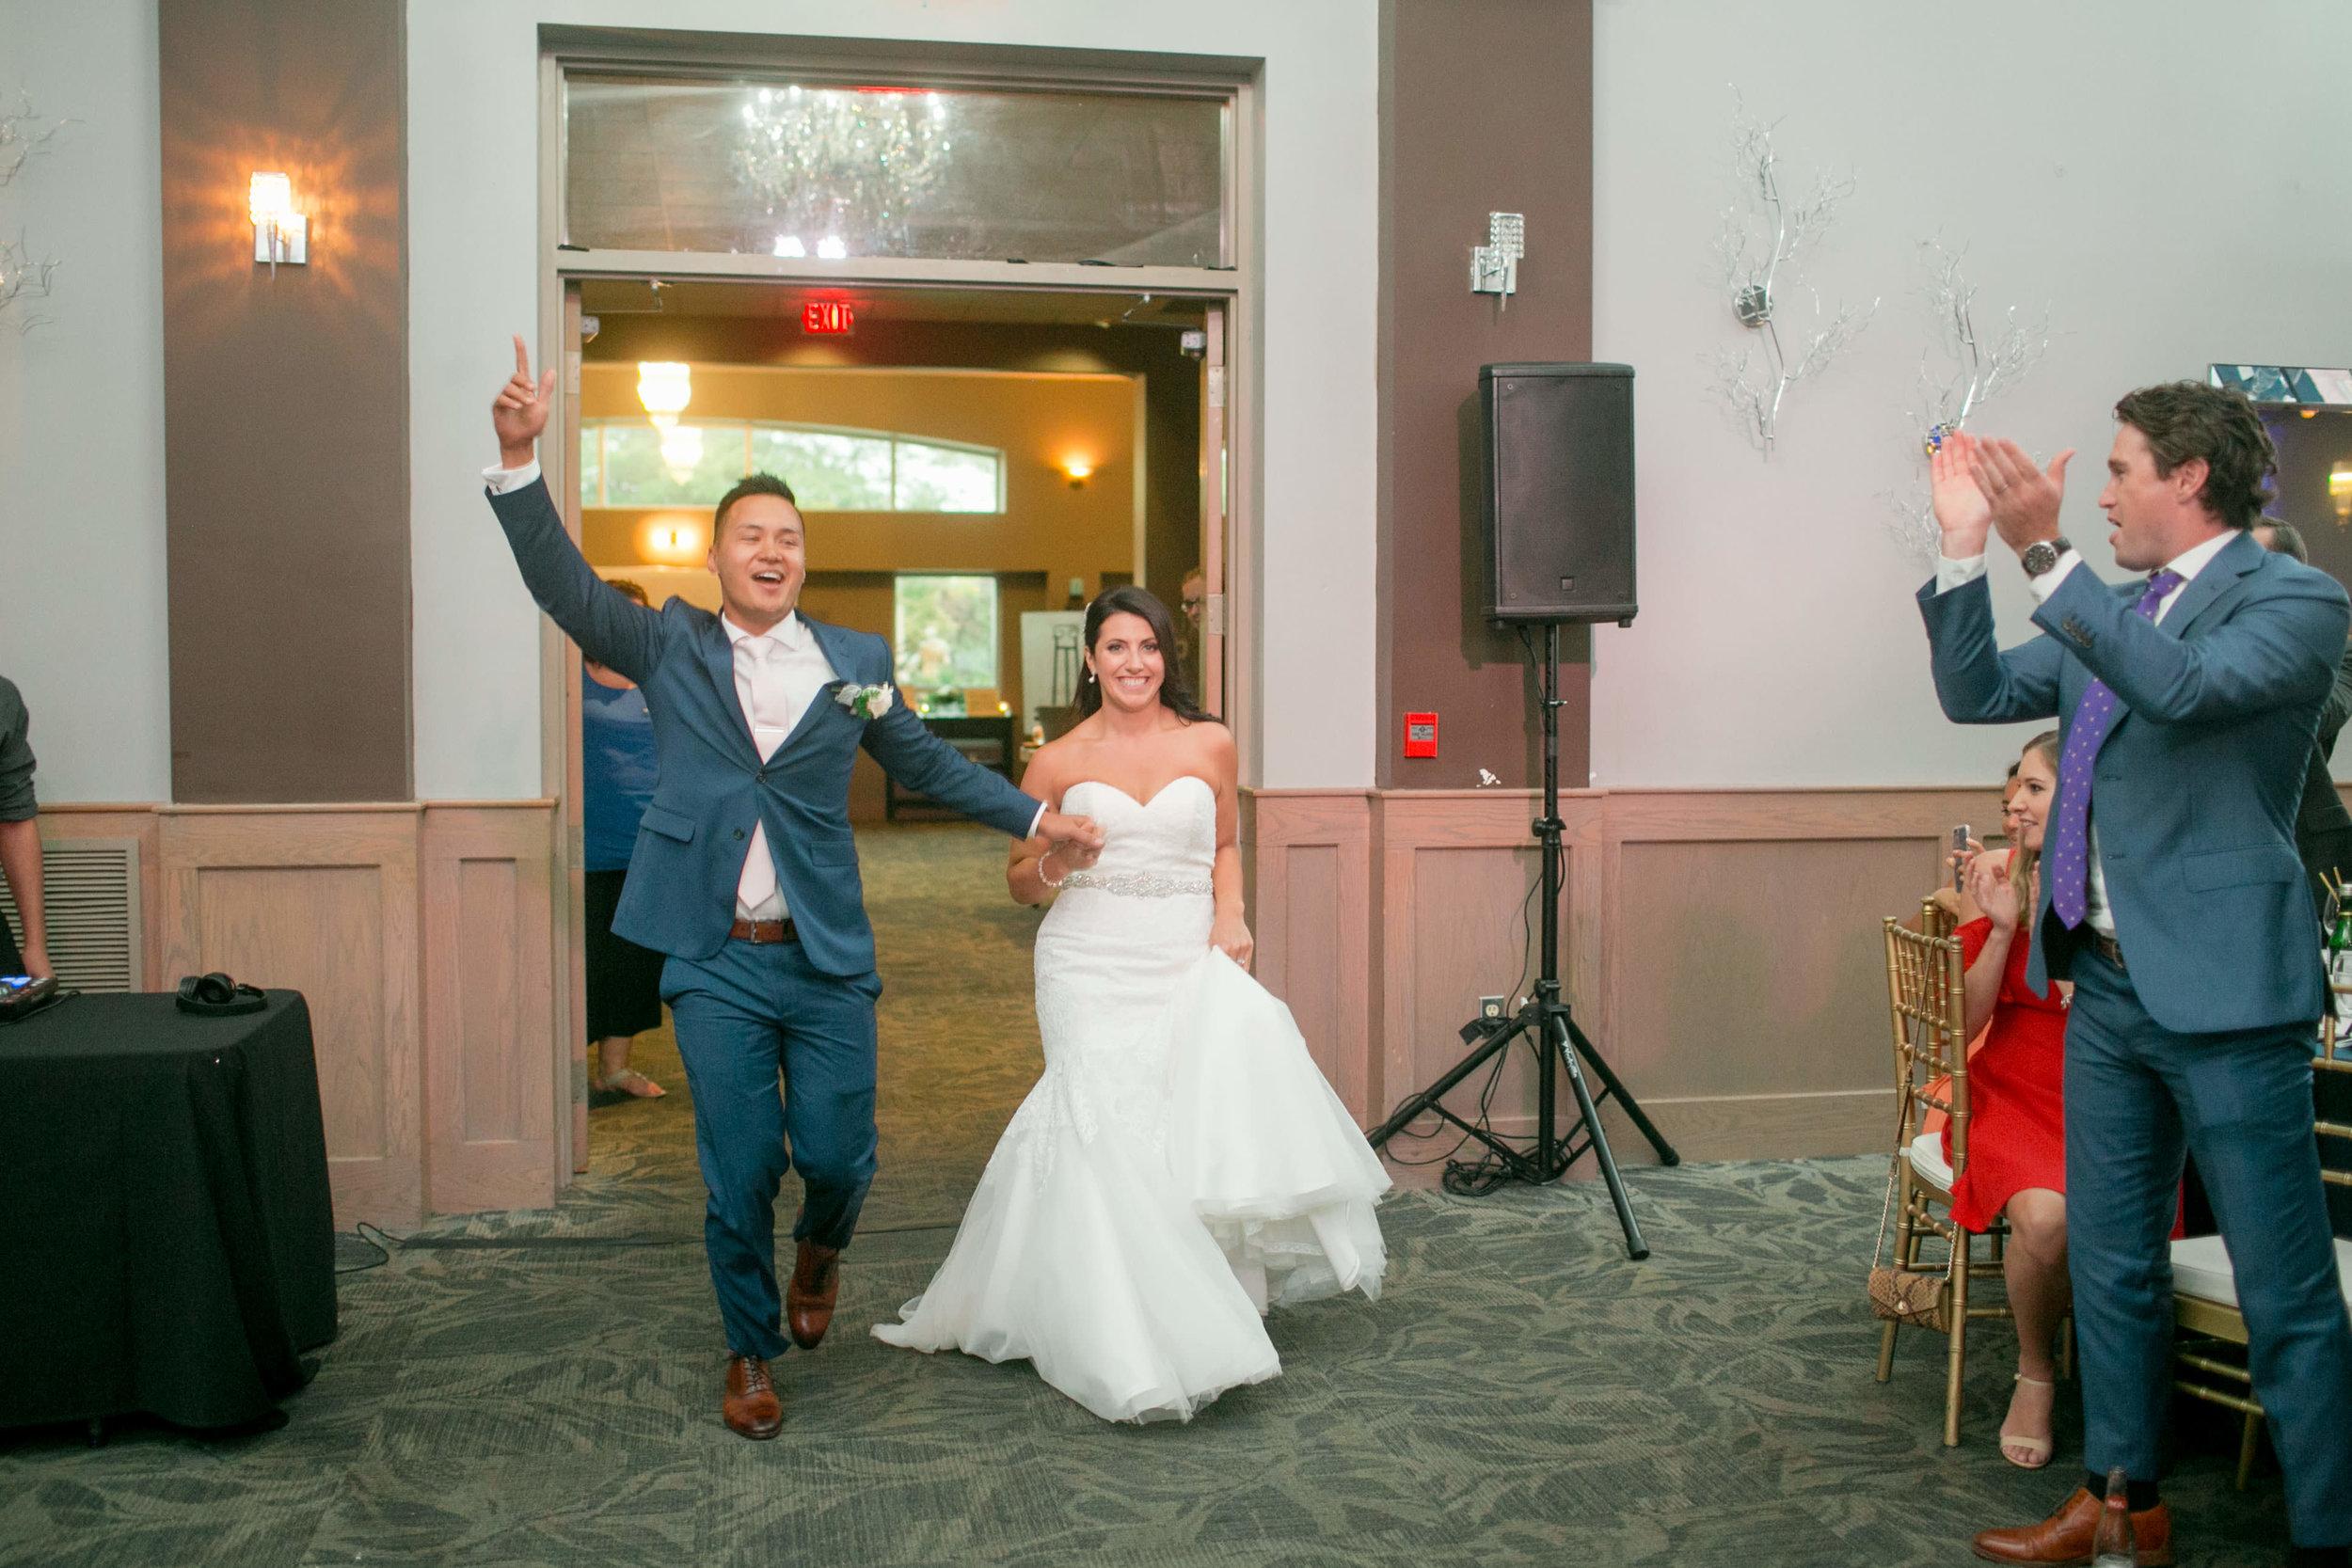 Stefanie___Bernard___Daniel_Ricci_Weddings_High_Res._Finals__532.jpg